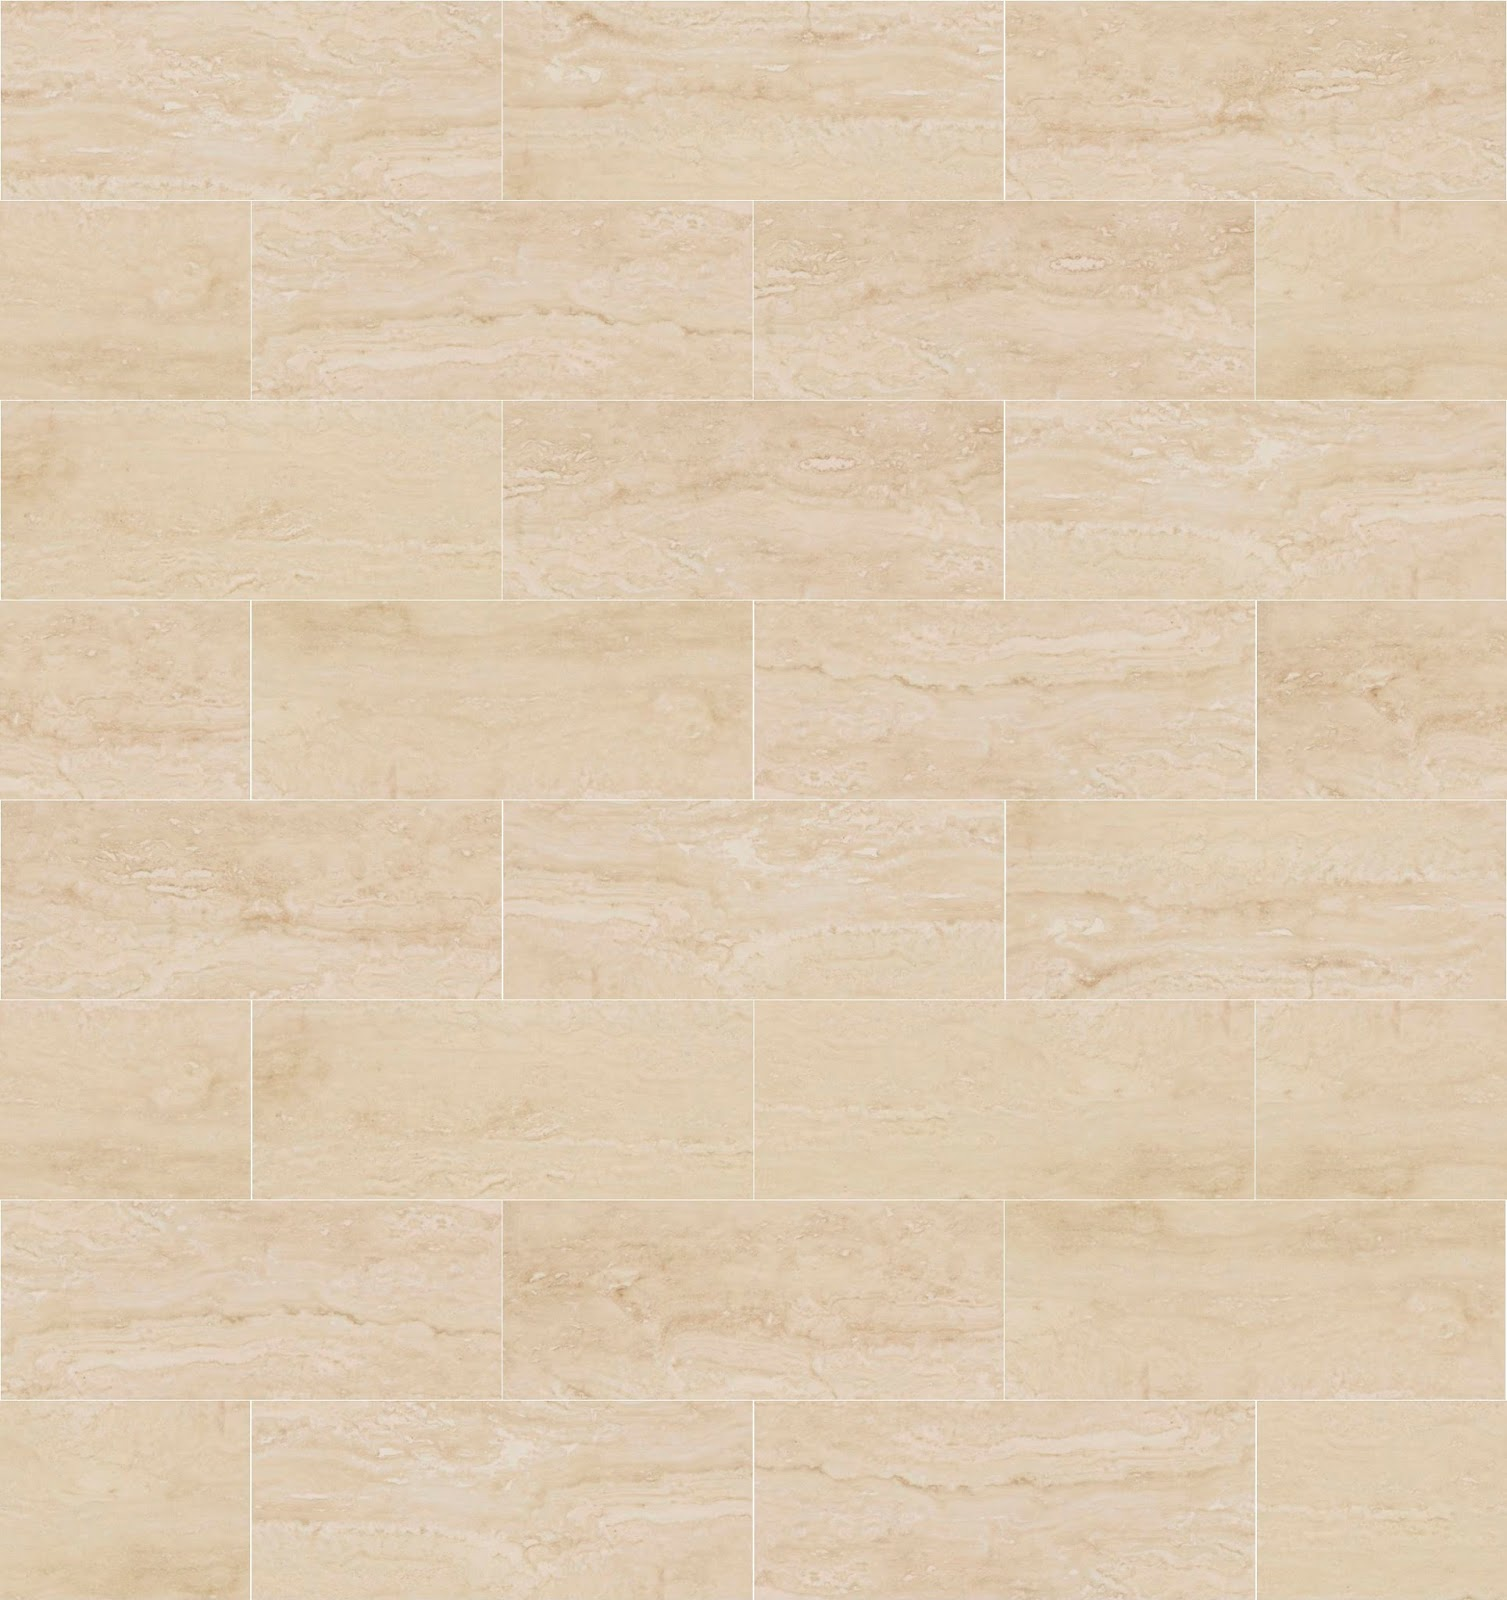 Simo 3d Blogspot Com Texture Seamless Rivestimento Marmo